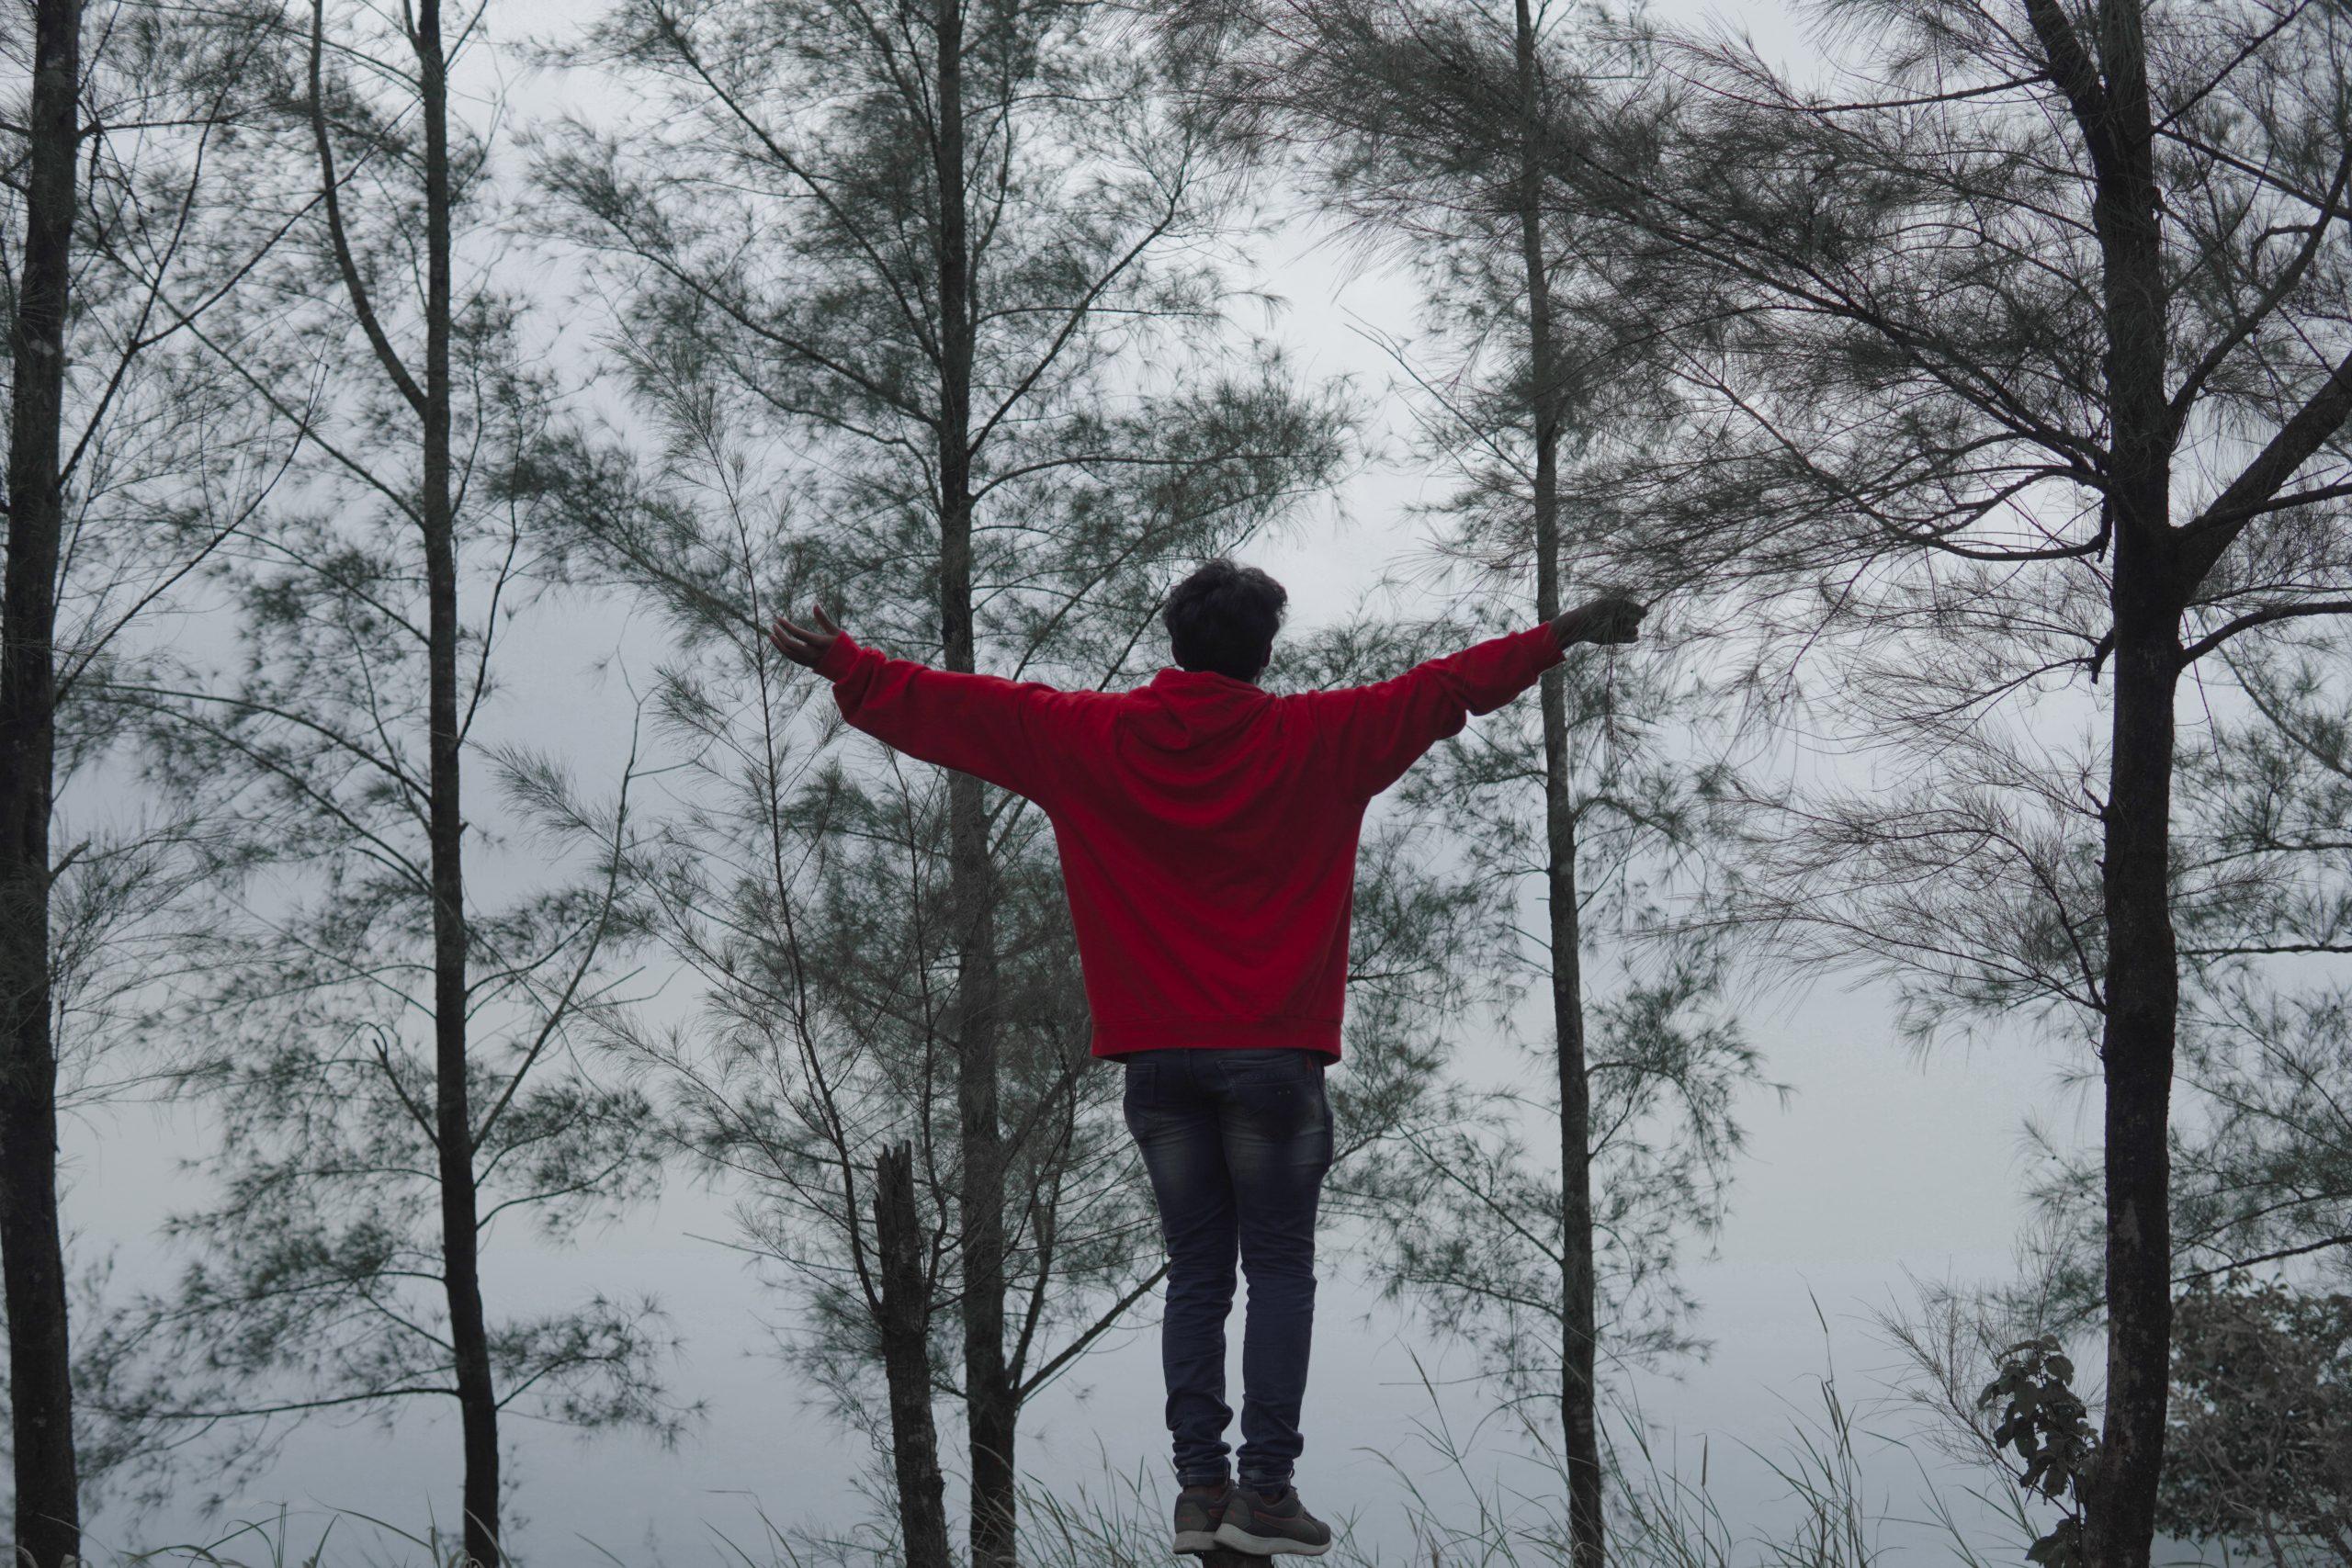 man admiring a snow forest